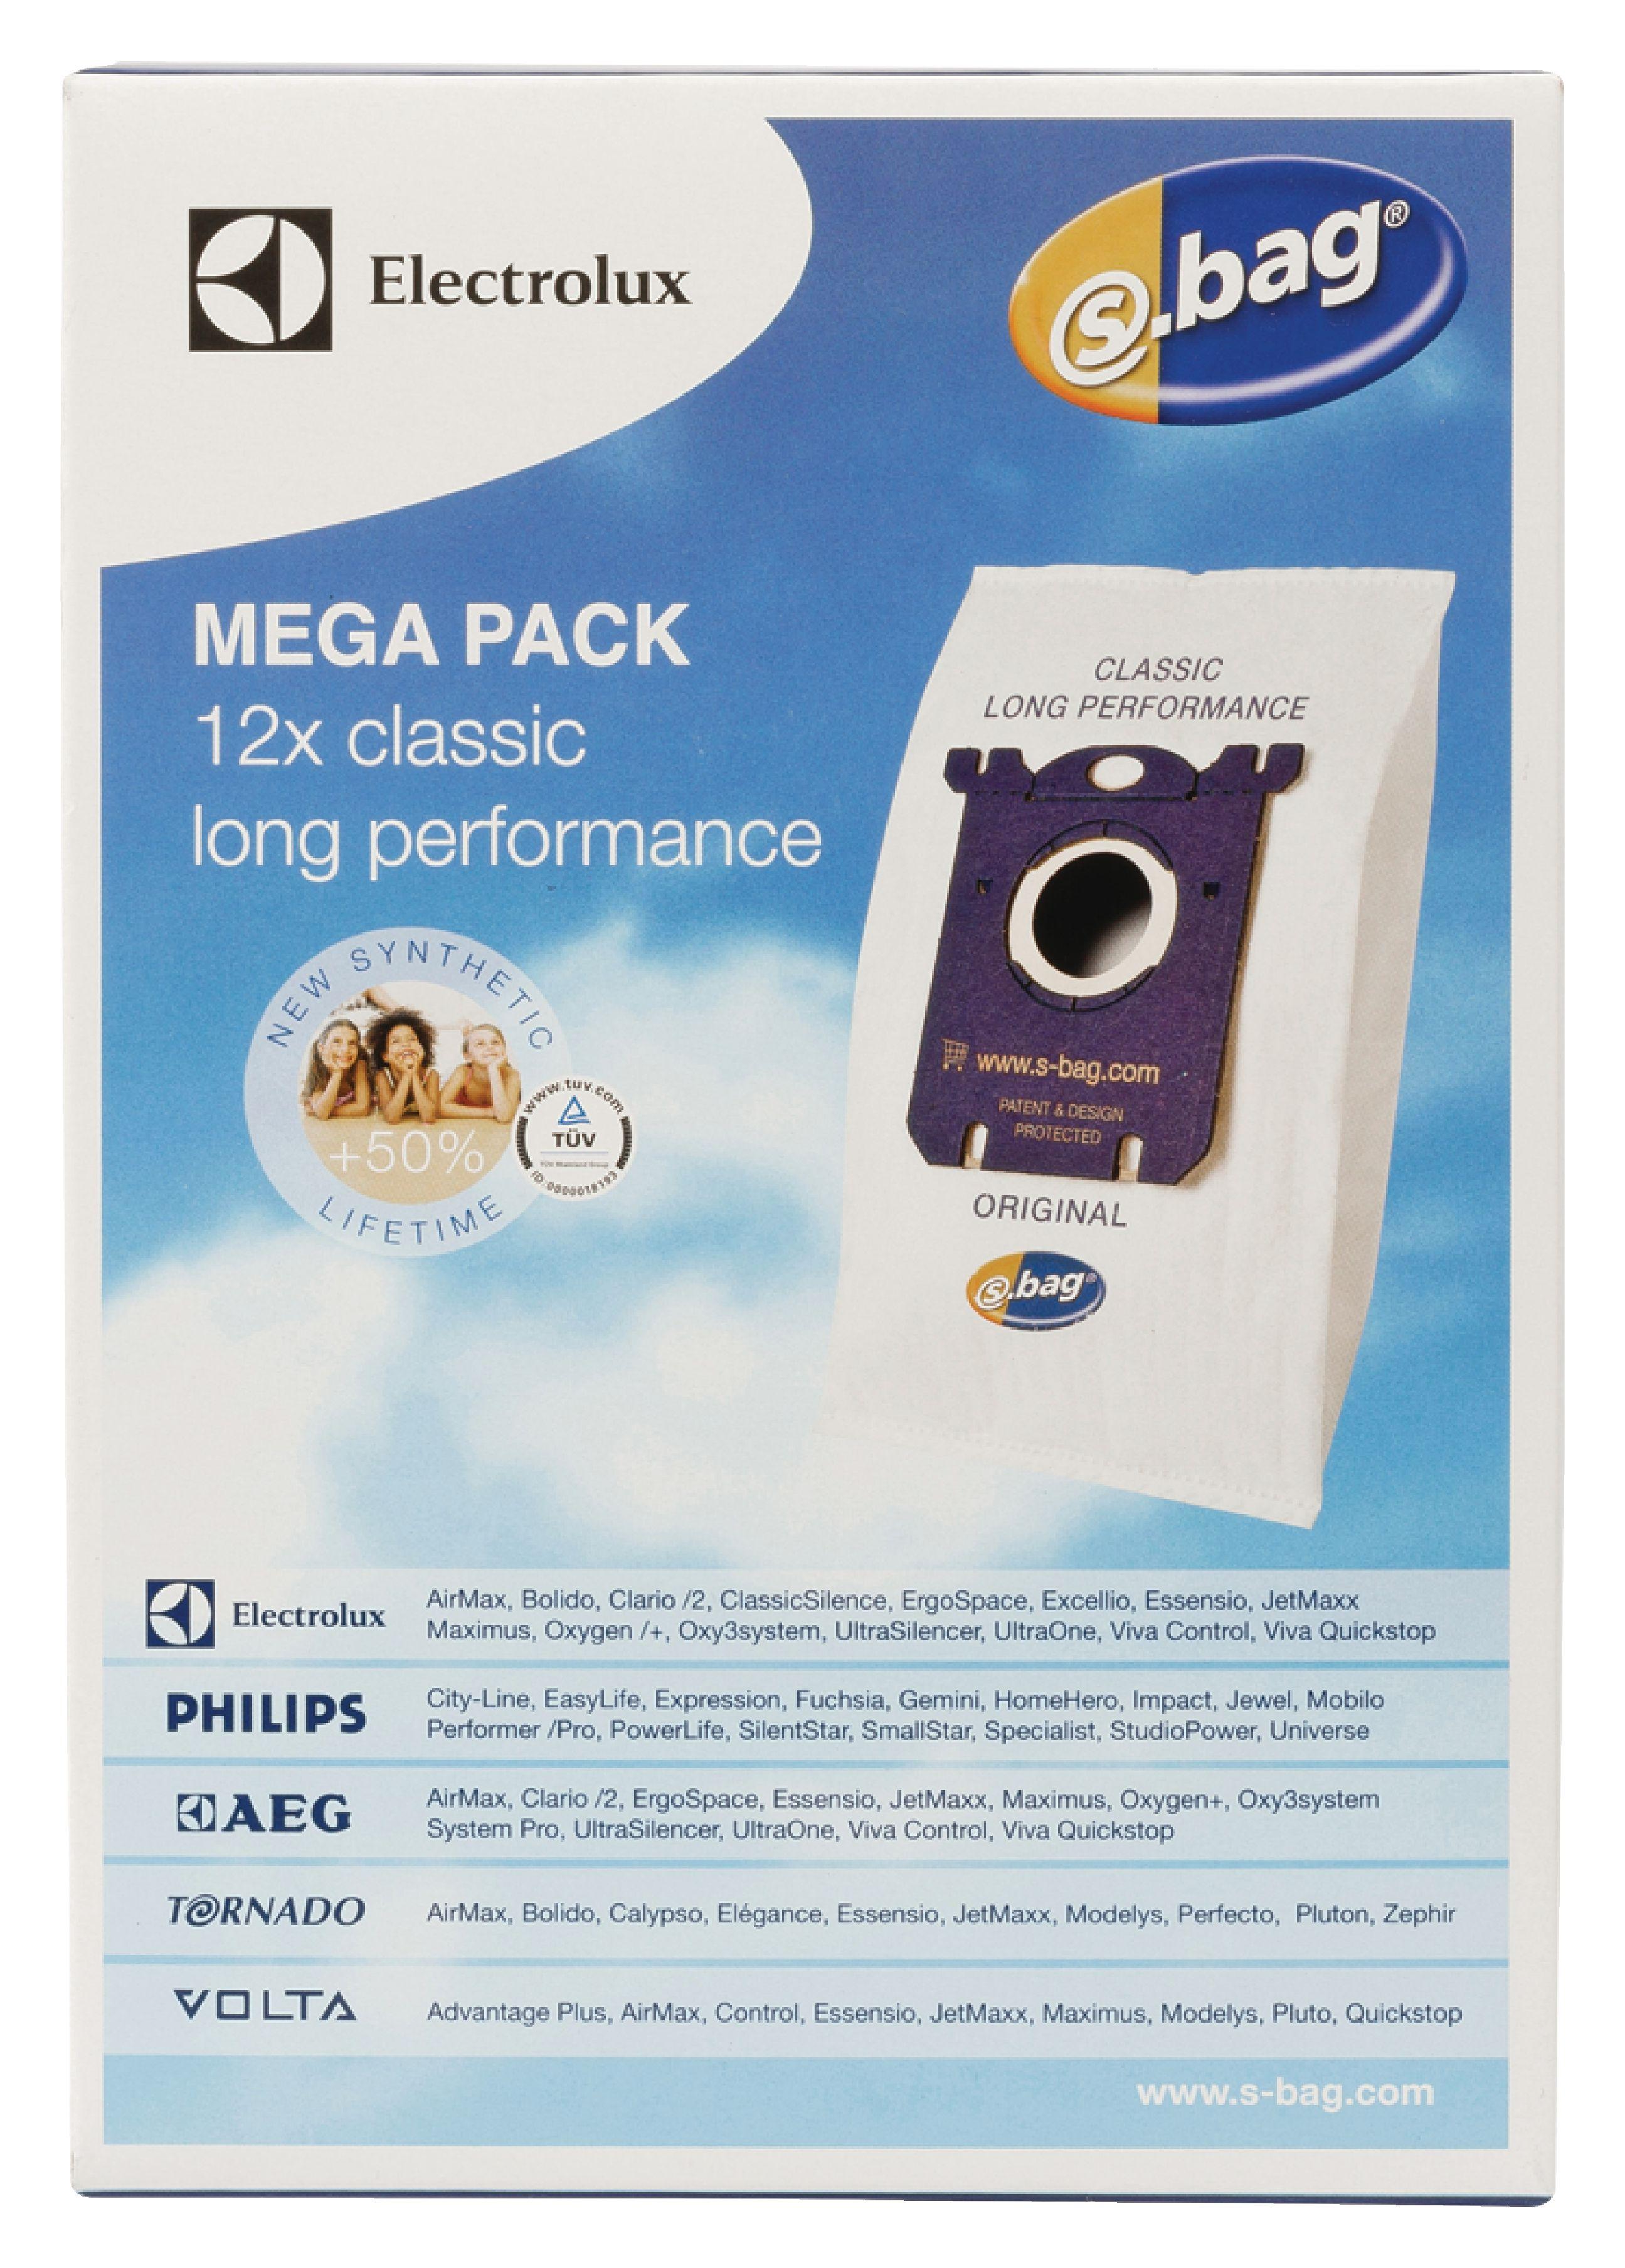 0b552a83326 ... 9002560994 : Electrolux - Vacuum Cleaner Bag E201M. Type: S-bag classic  long performance Mega pack E 201M